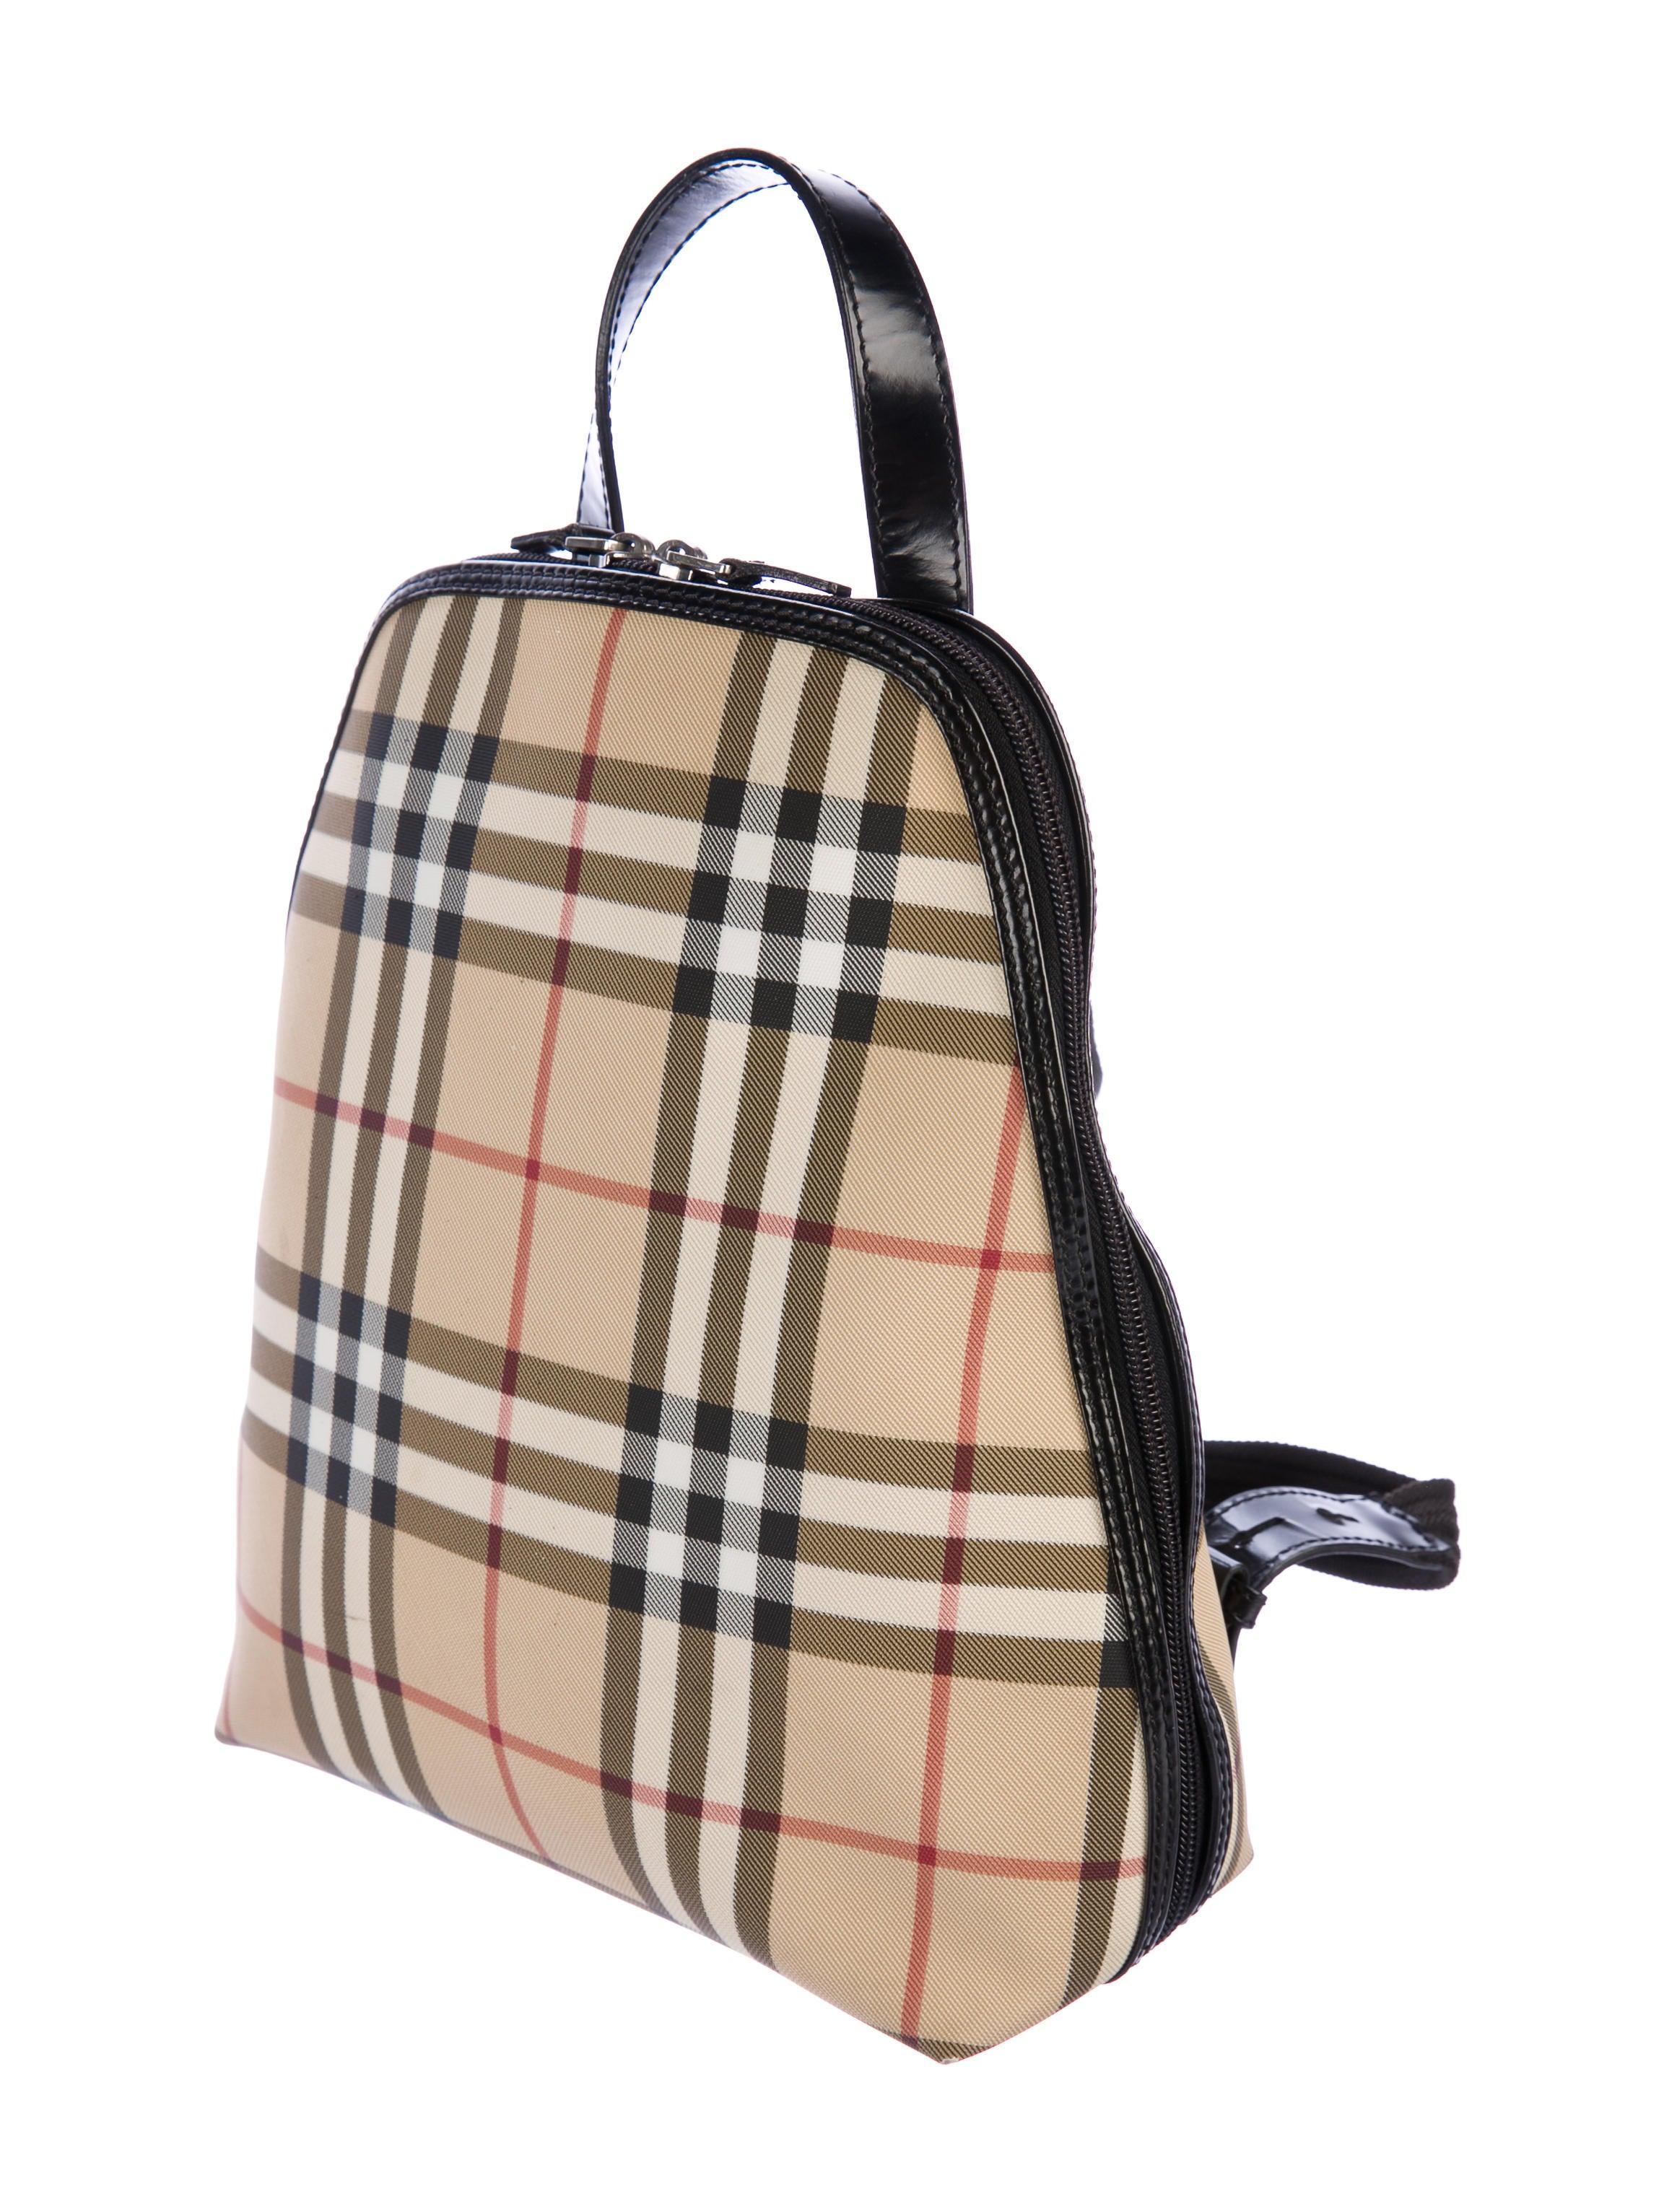 Burberry London Nova Check Backpack - Handbags - BUR78716 ...